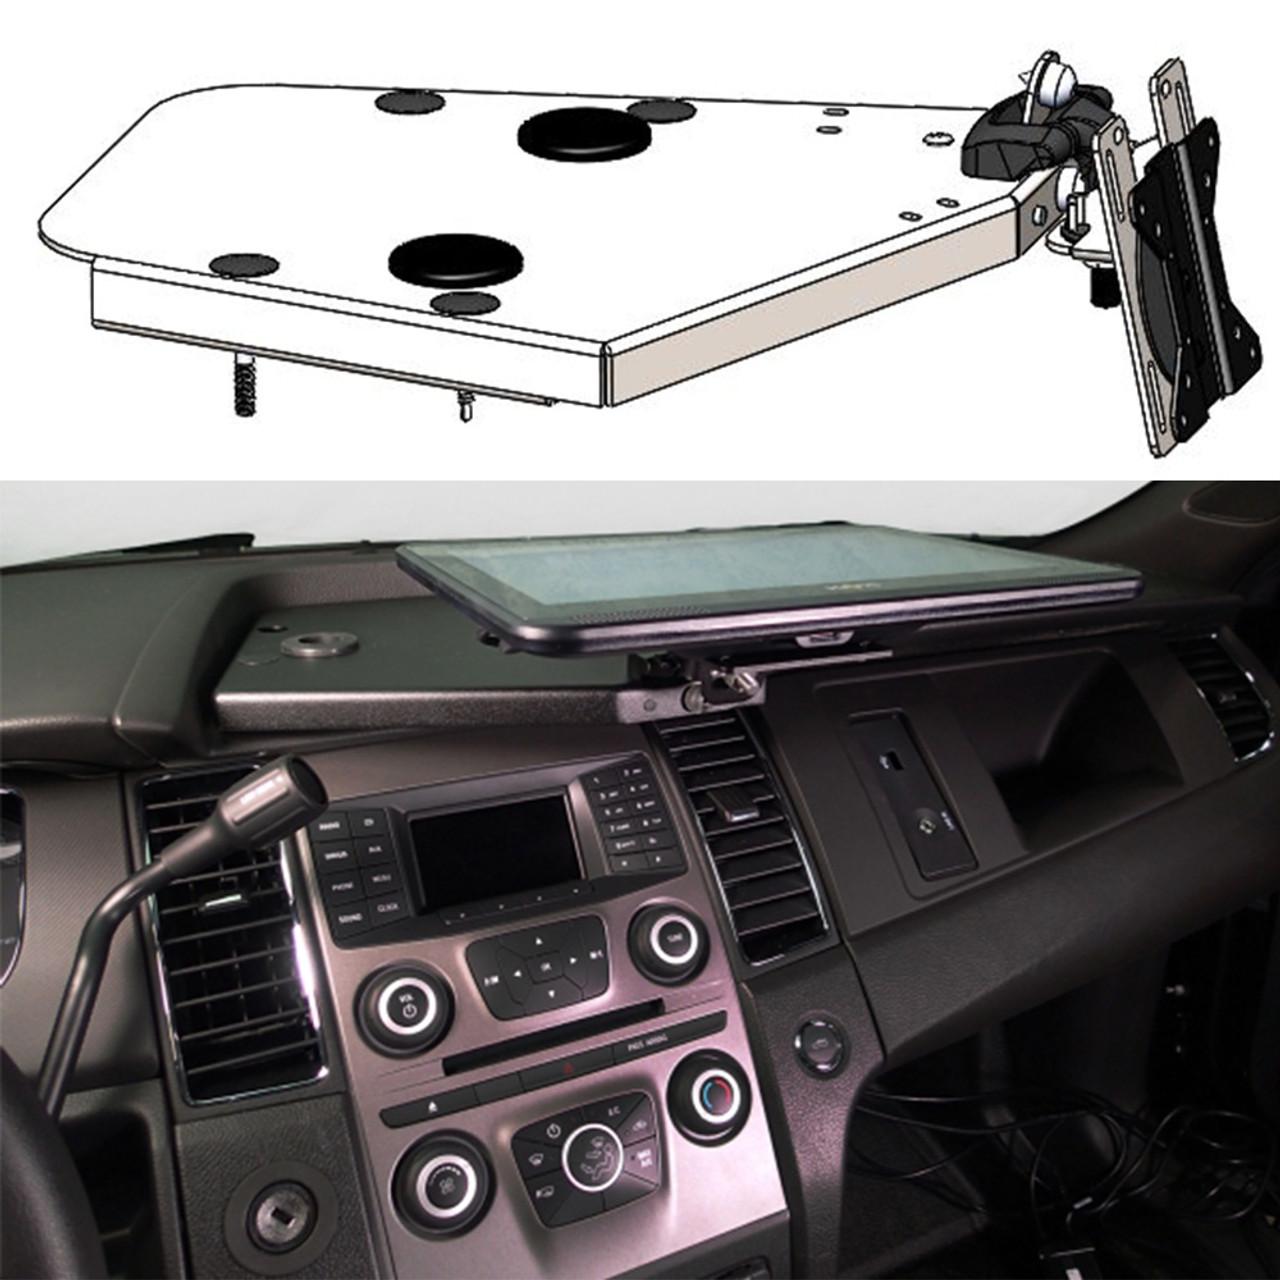 Havis C-DMM-2002 Dashboard Monitor or Tablet Mount for 2013-2019 Ford Law Enforcement Interceptor Sedan,  Landscape or Portrait Applications with Tilt Swivel Motion for Left, Right, Up and Down Positioning